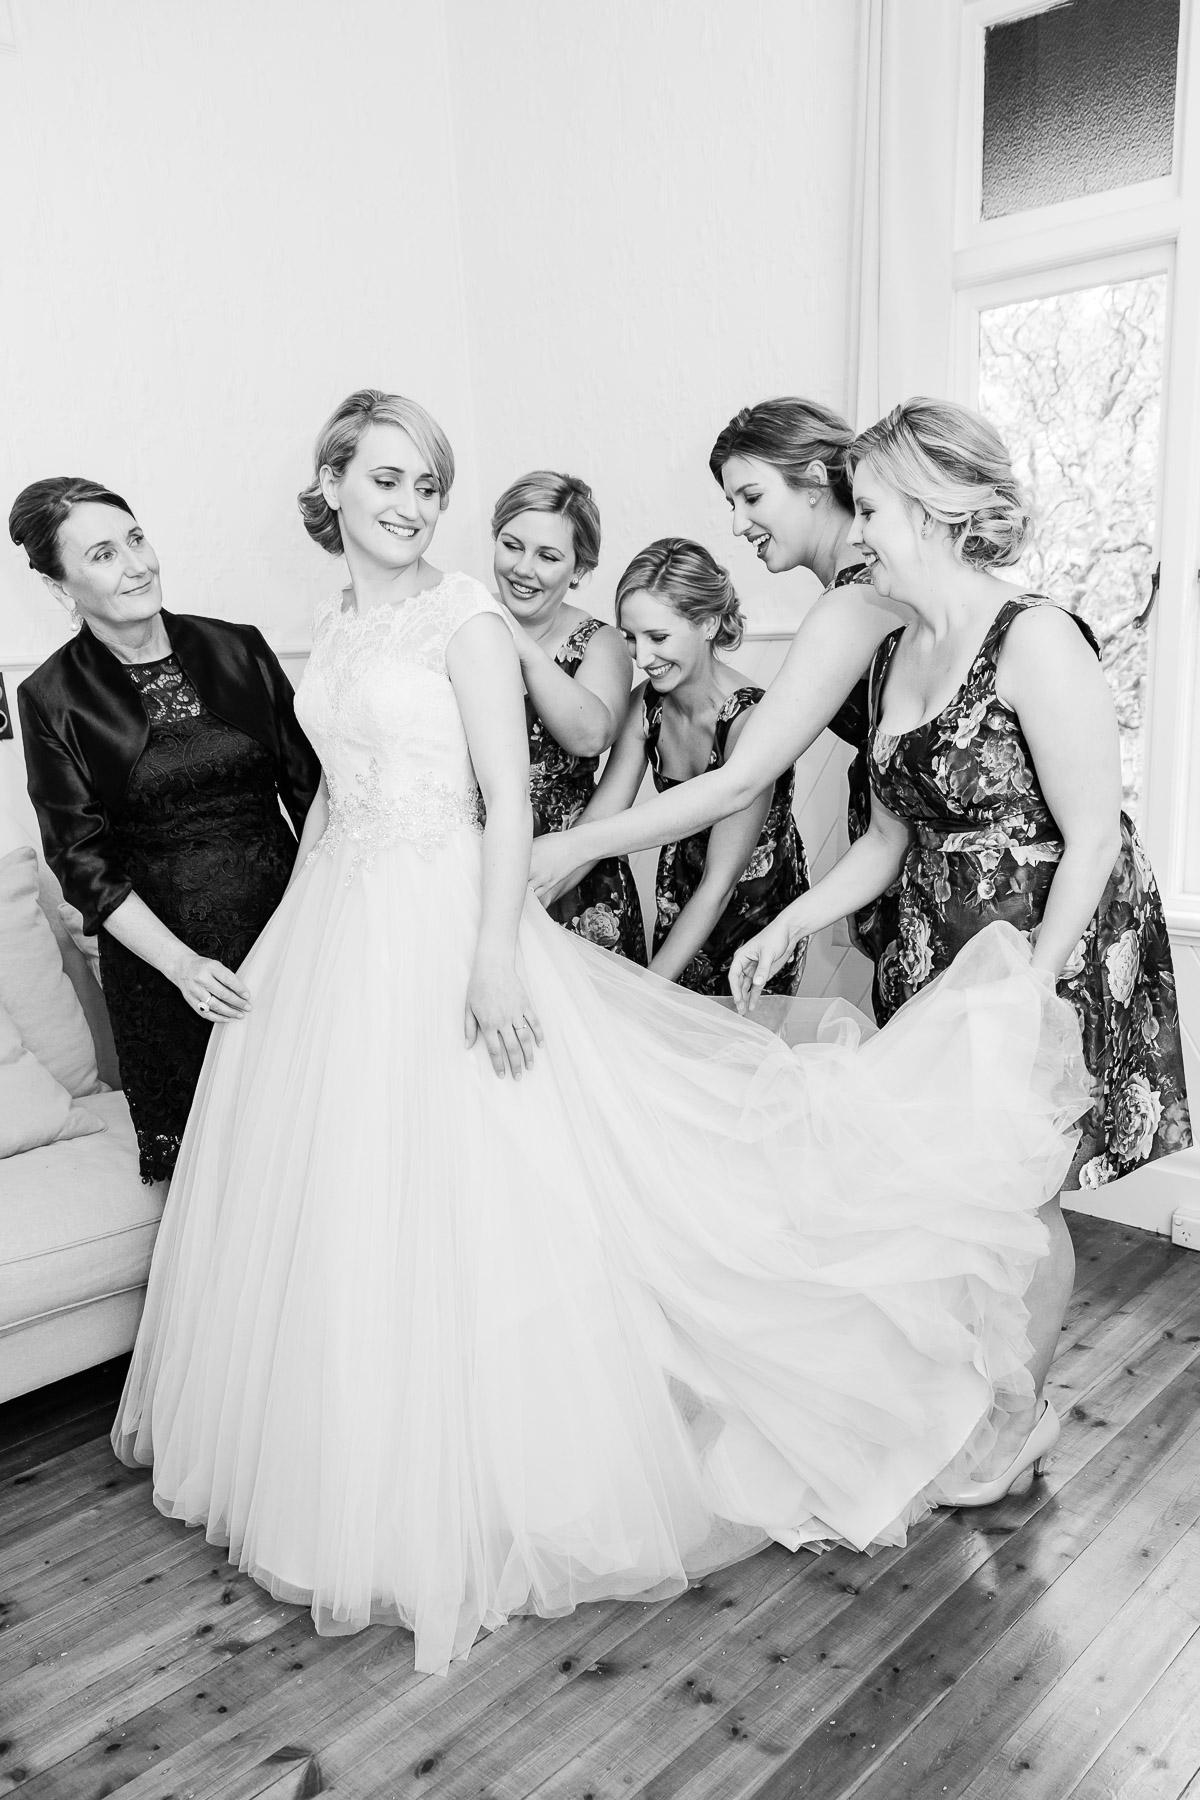 Marnie_and_Charlie_Yarra_Valley_Wedding_Blog-17.jpg